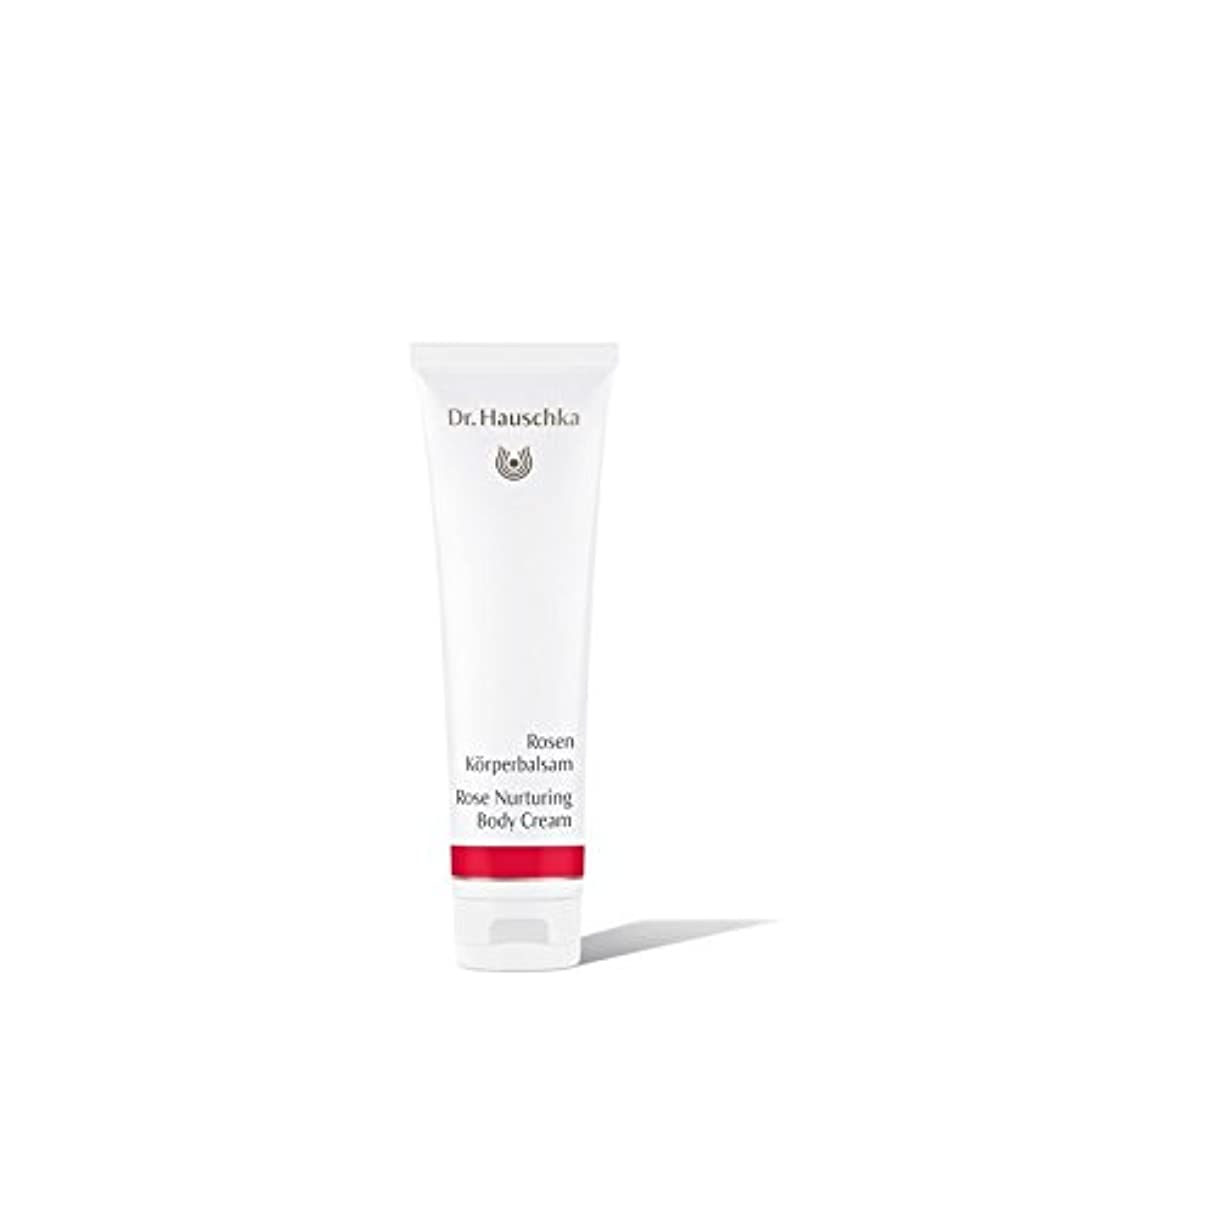 Dr. Hauschka Rose Nurturing Body Cream (145ml) (Pack of 6) - ハウシュカは、ボディクリーム(145ミリリットル)を育成バラ x6 [並行輸入品]